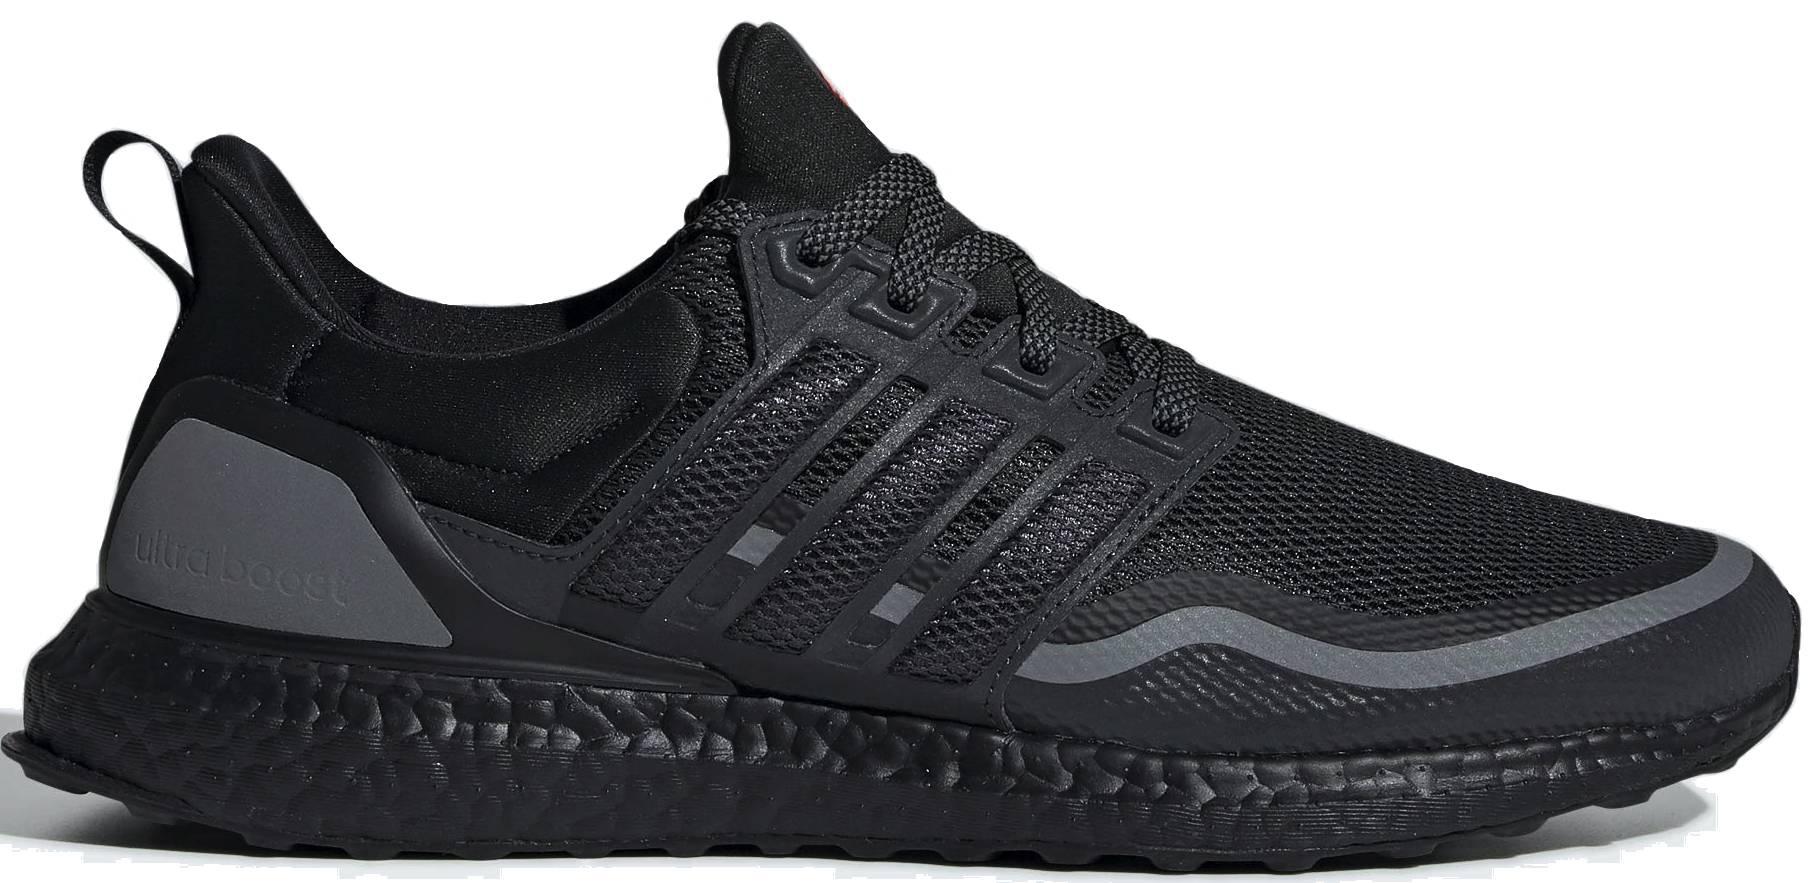 Adidas Ultraboost Reflective